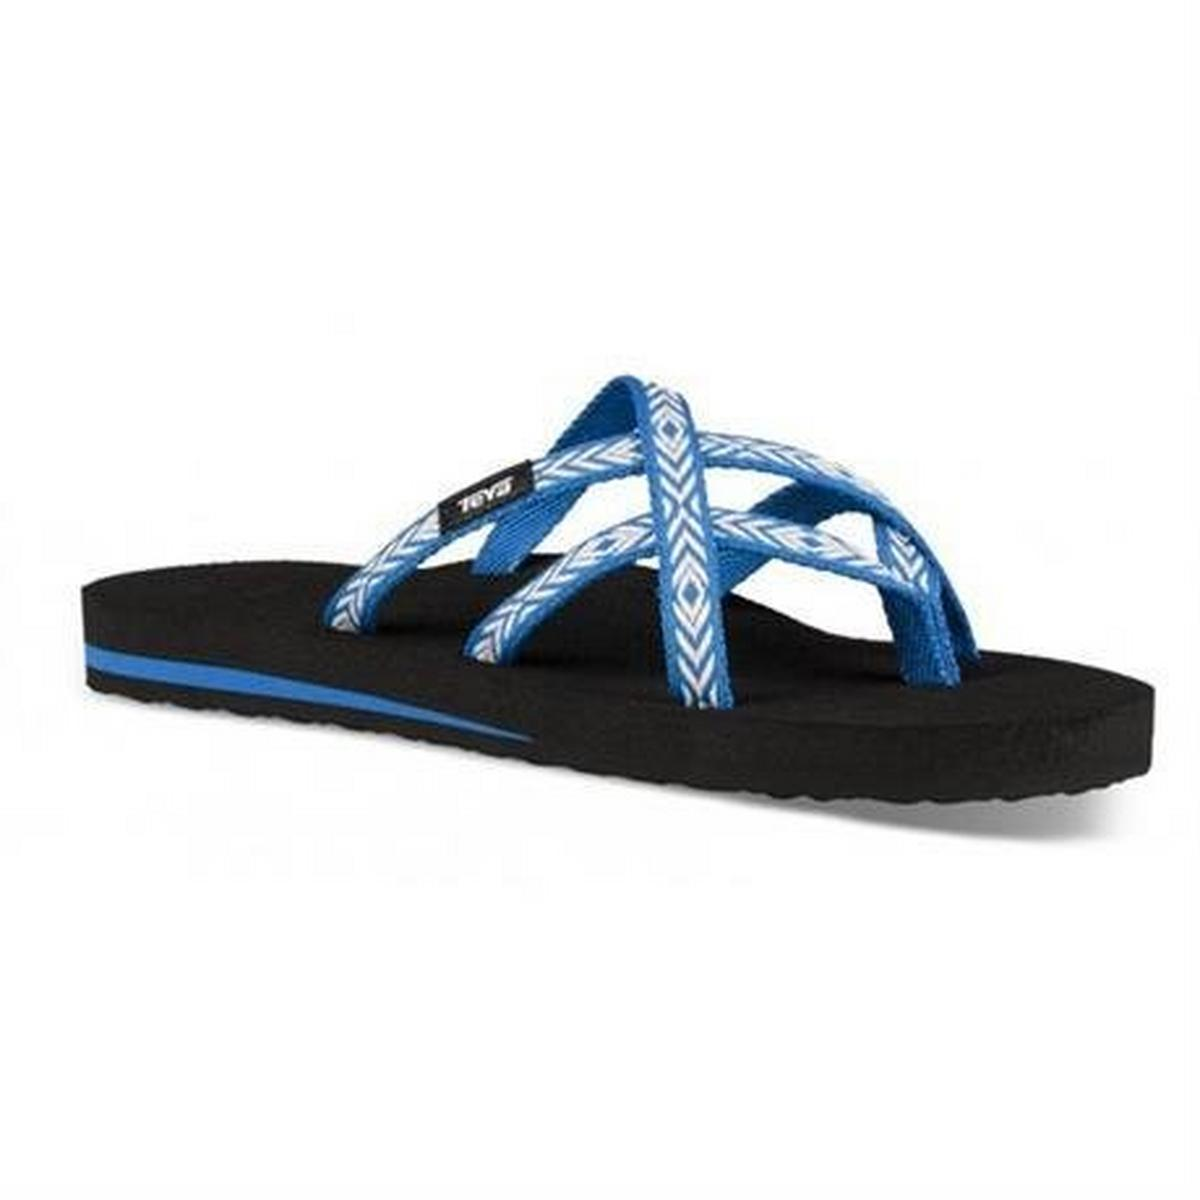 Teva Sandals Women's Olowahu Flip Himalaya Lapis Blue